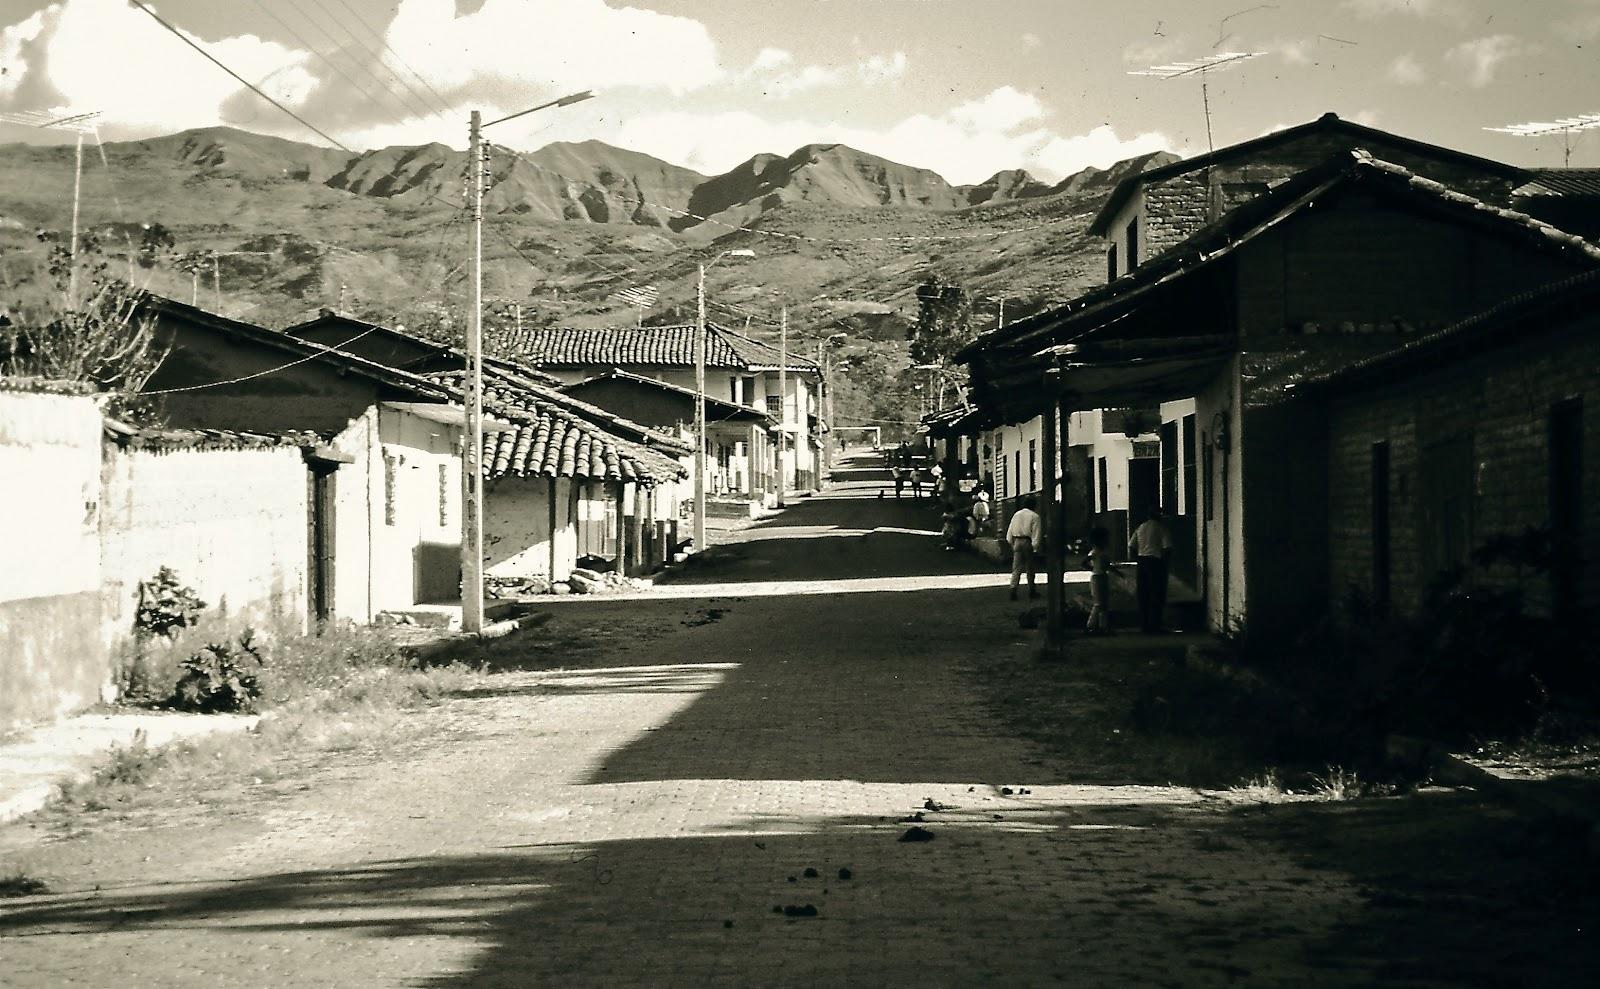 Viaje Ecuador Vilcabamba Valle Los Centenarios Mundos